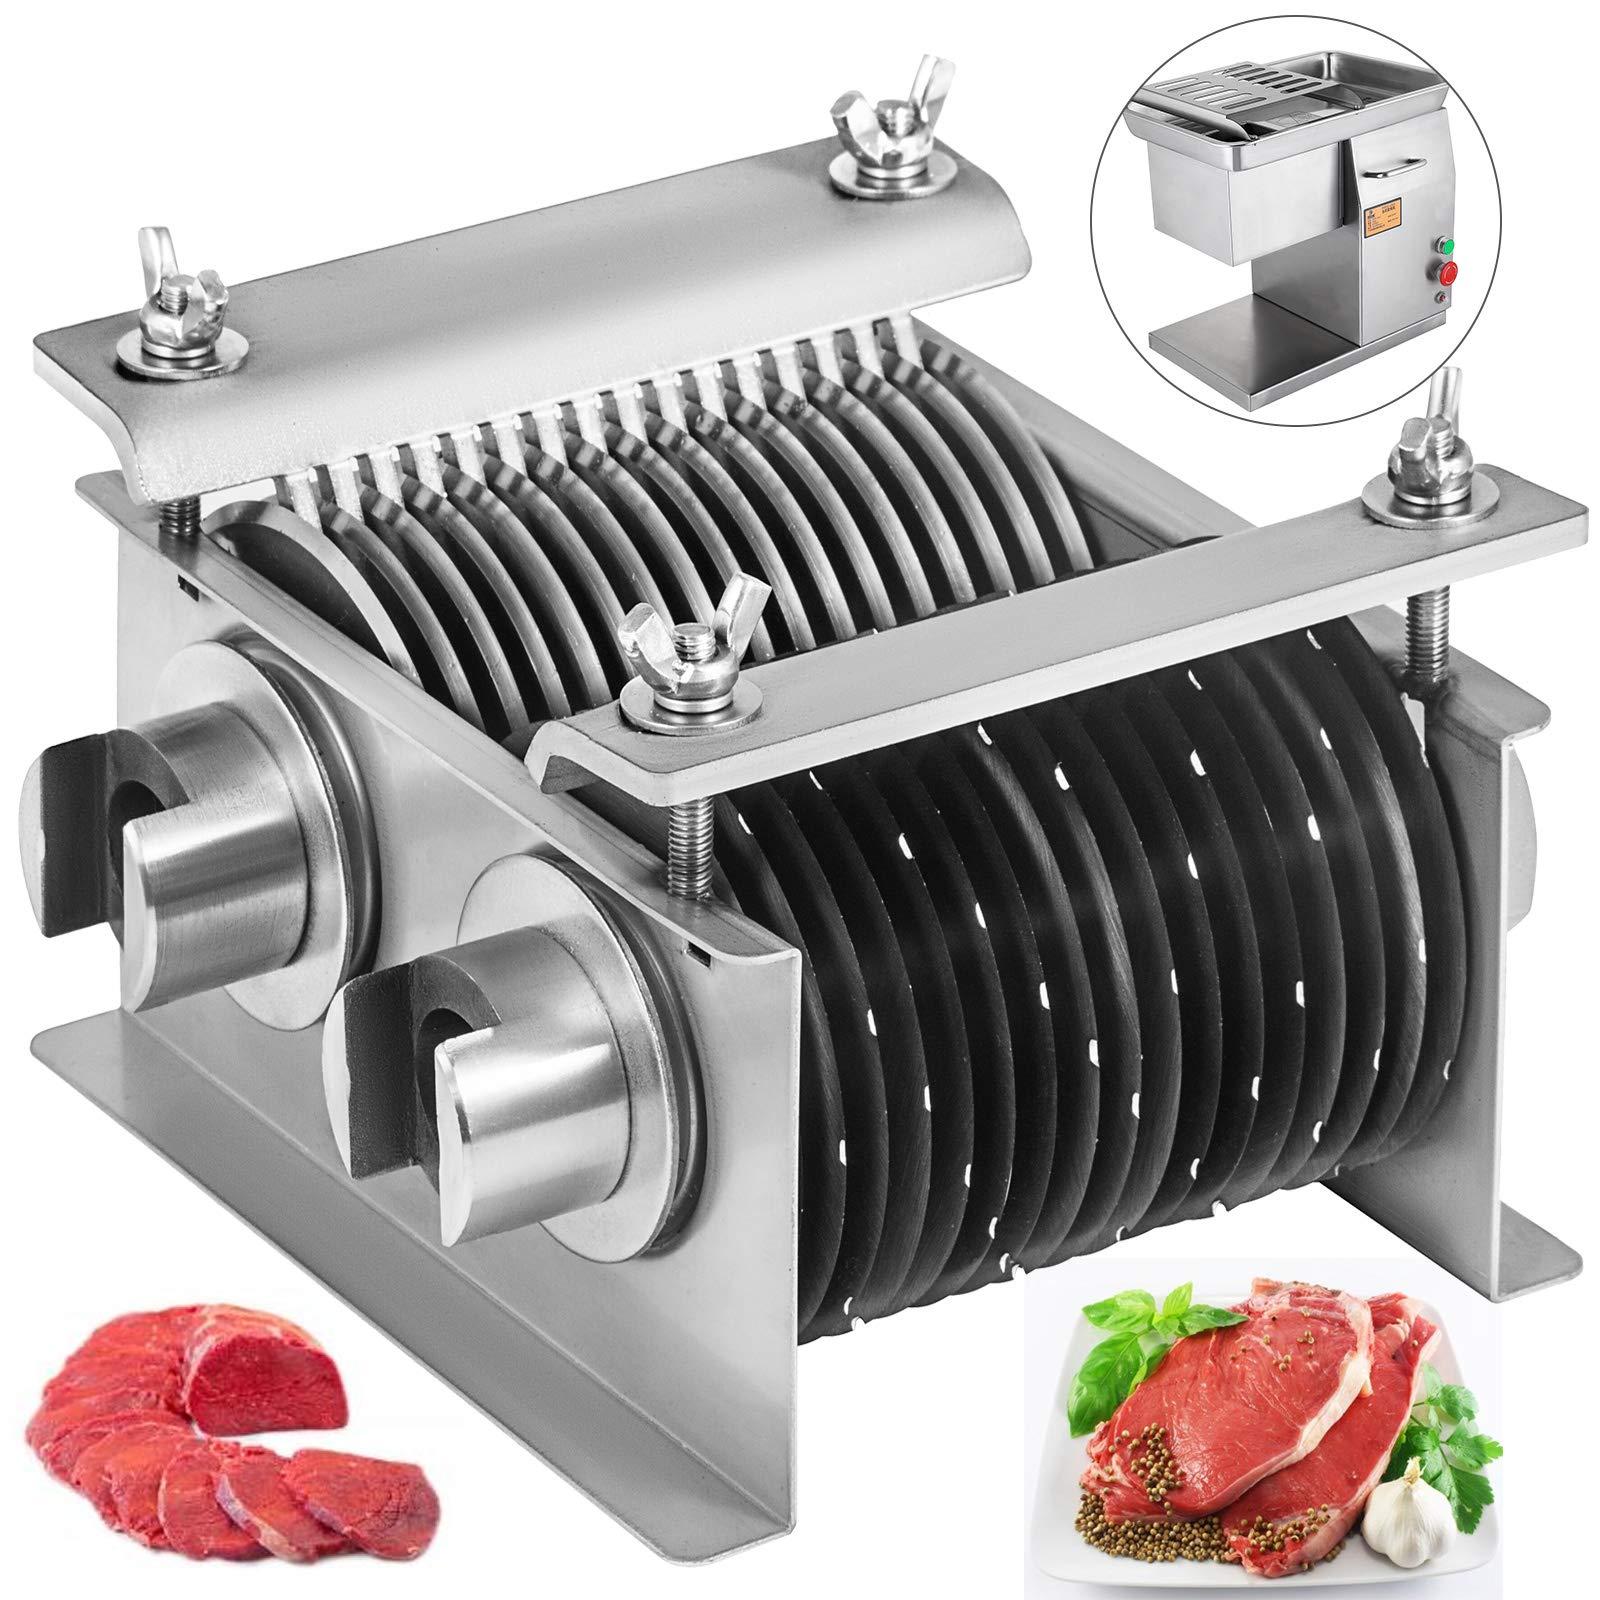 Happybuy One Set Blade 5 mm for TSDP-48 Model Meat Cutting Machine Cutter Slicer 250KG